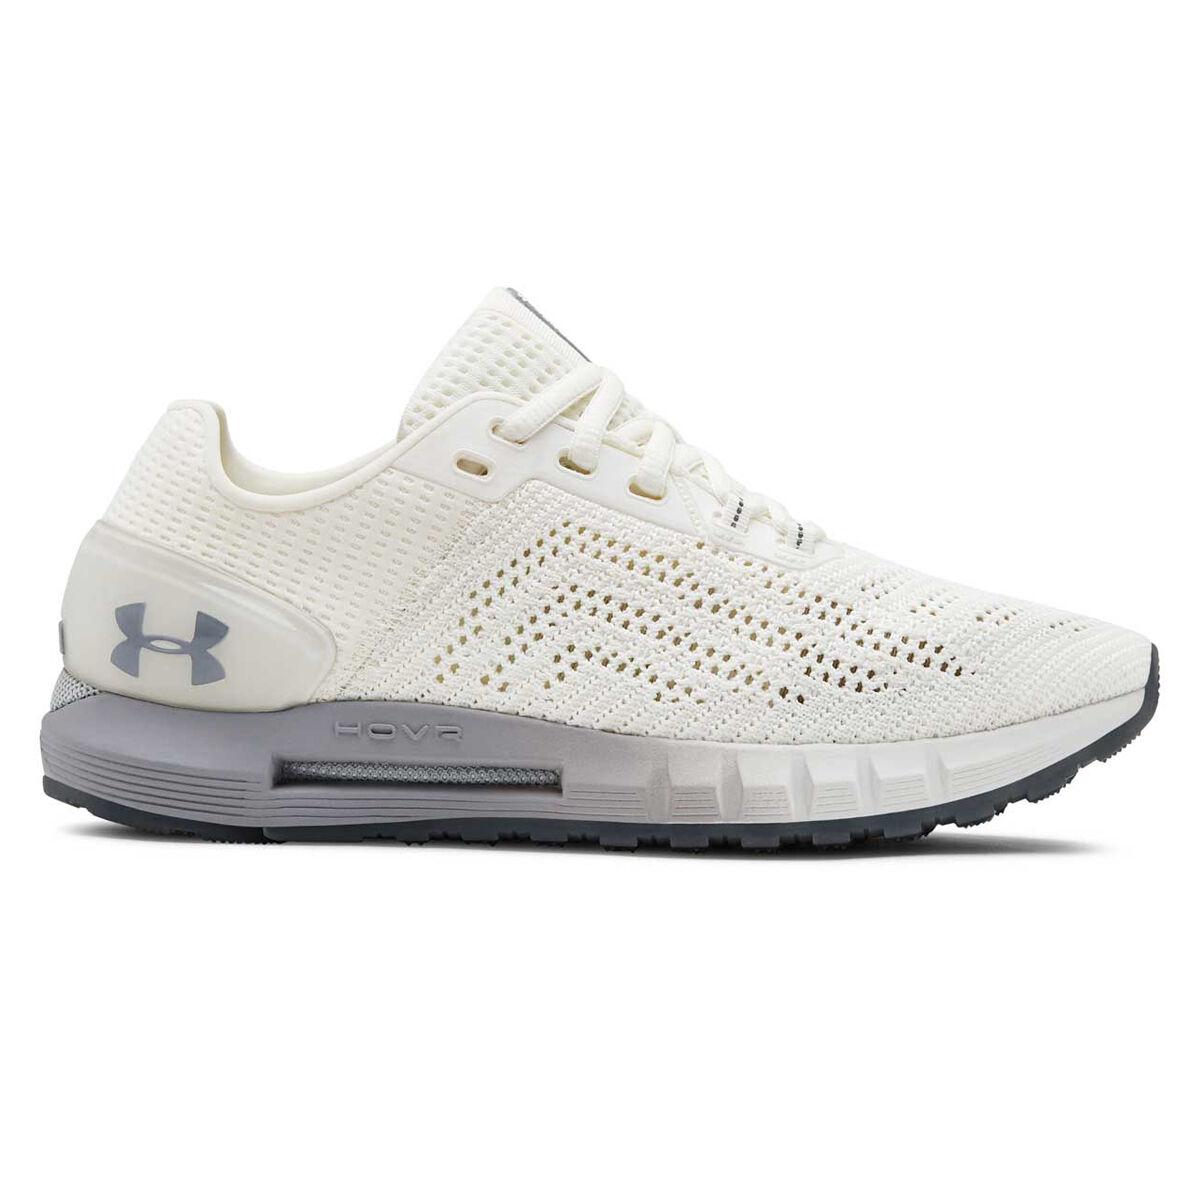 Womens Running Shoes White / Grey